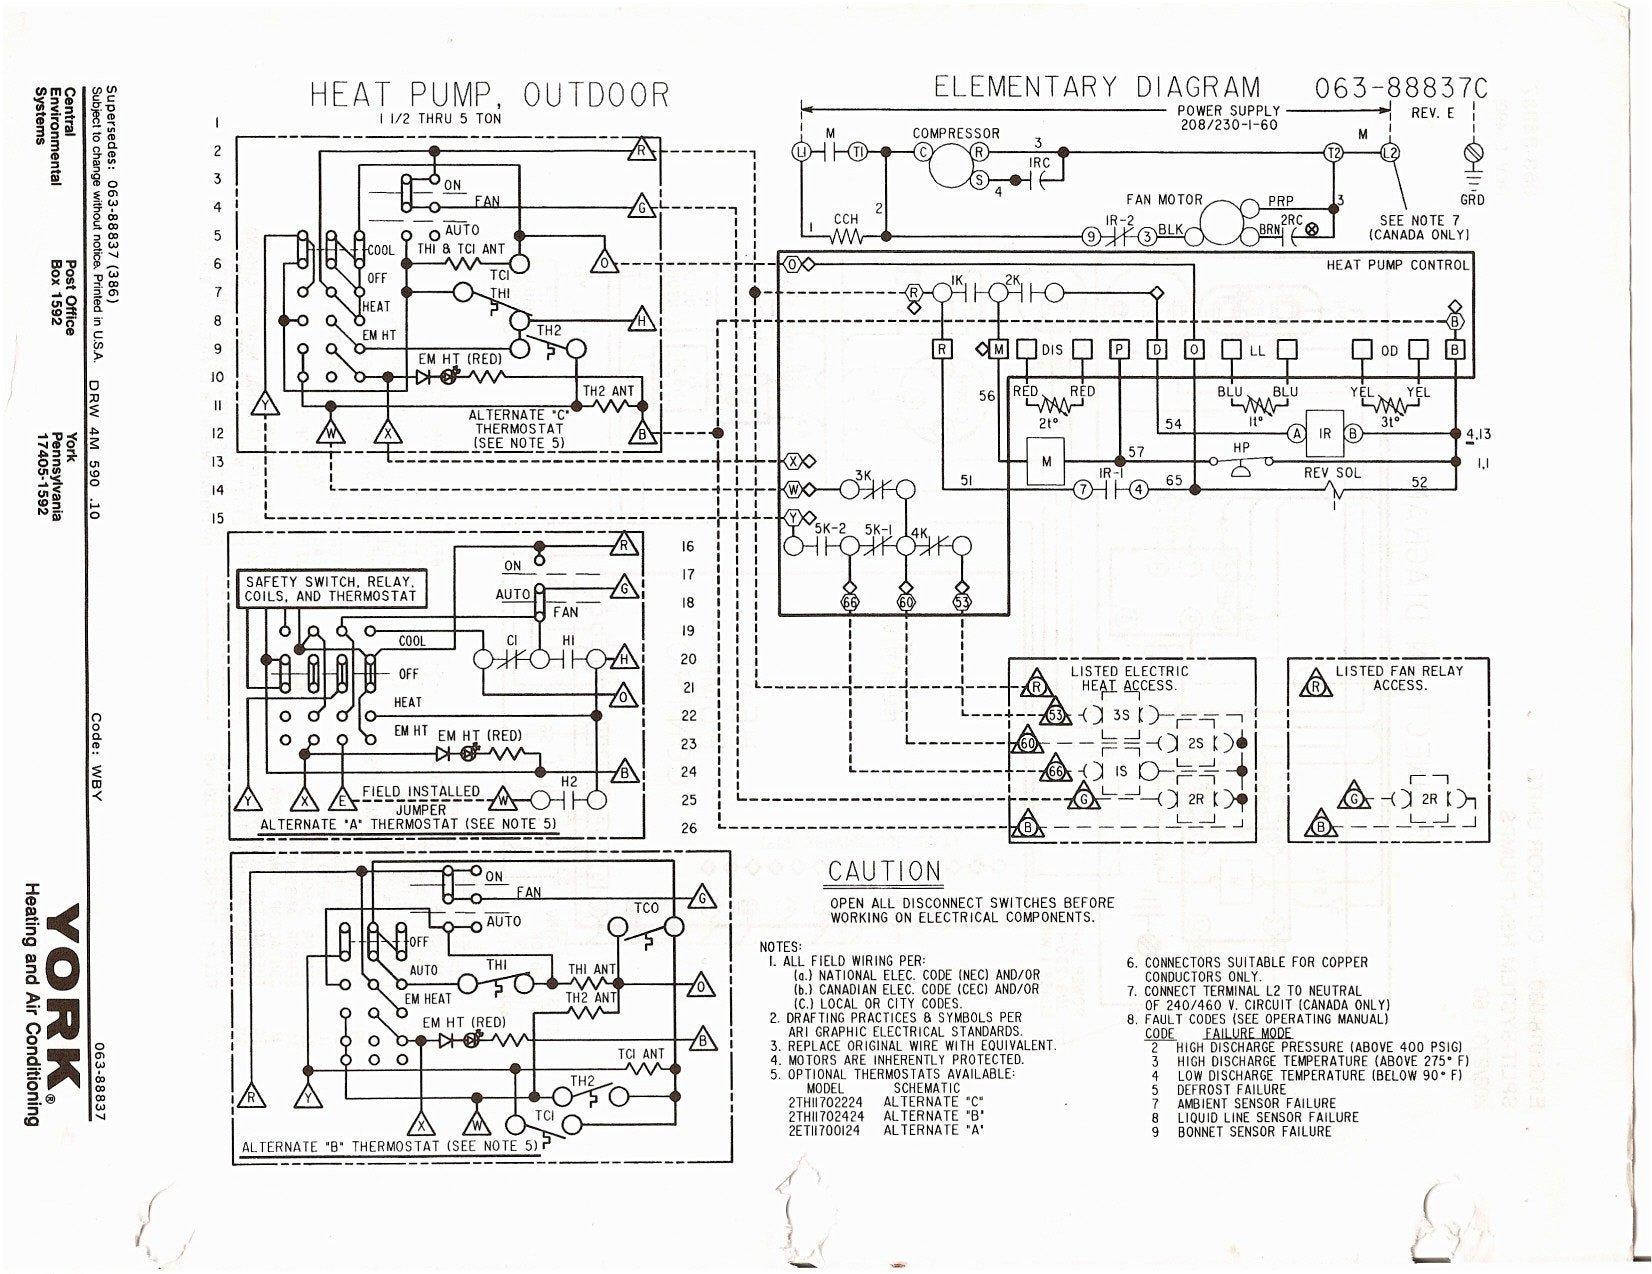 heat pump thermostat with emergency wiring diagram wiring solutions rh rausco com Nest Thermostat Heat Pump Wiring Diagram Basic Heat Pump Wiring Diagram